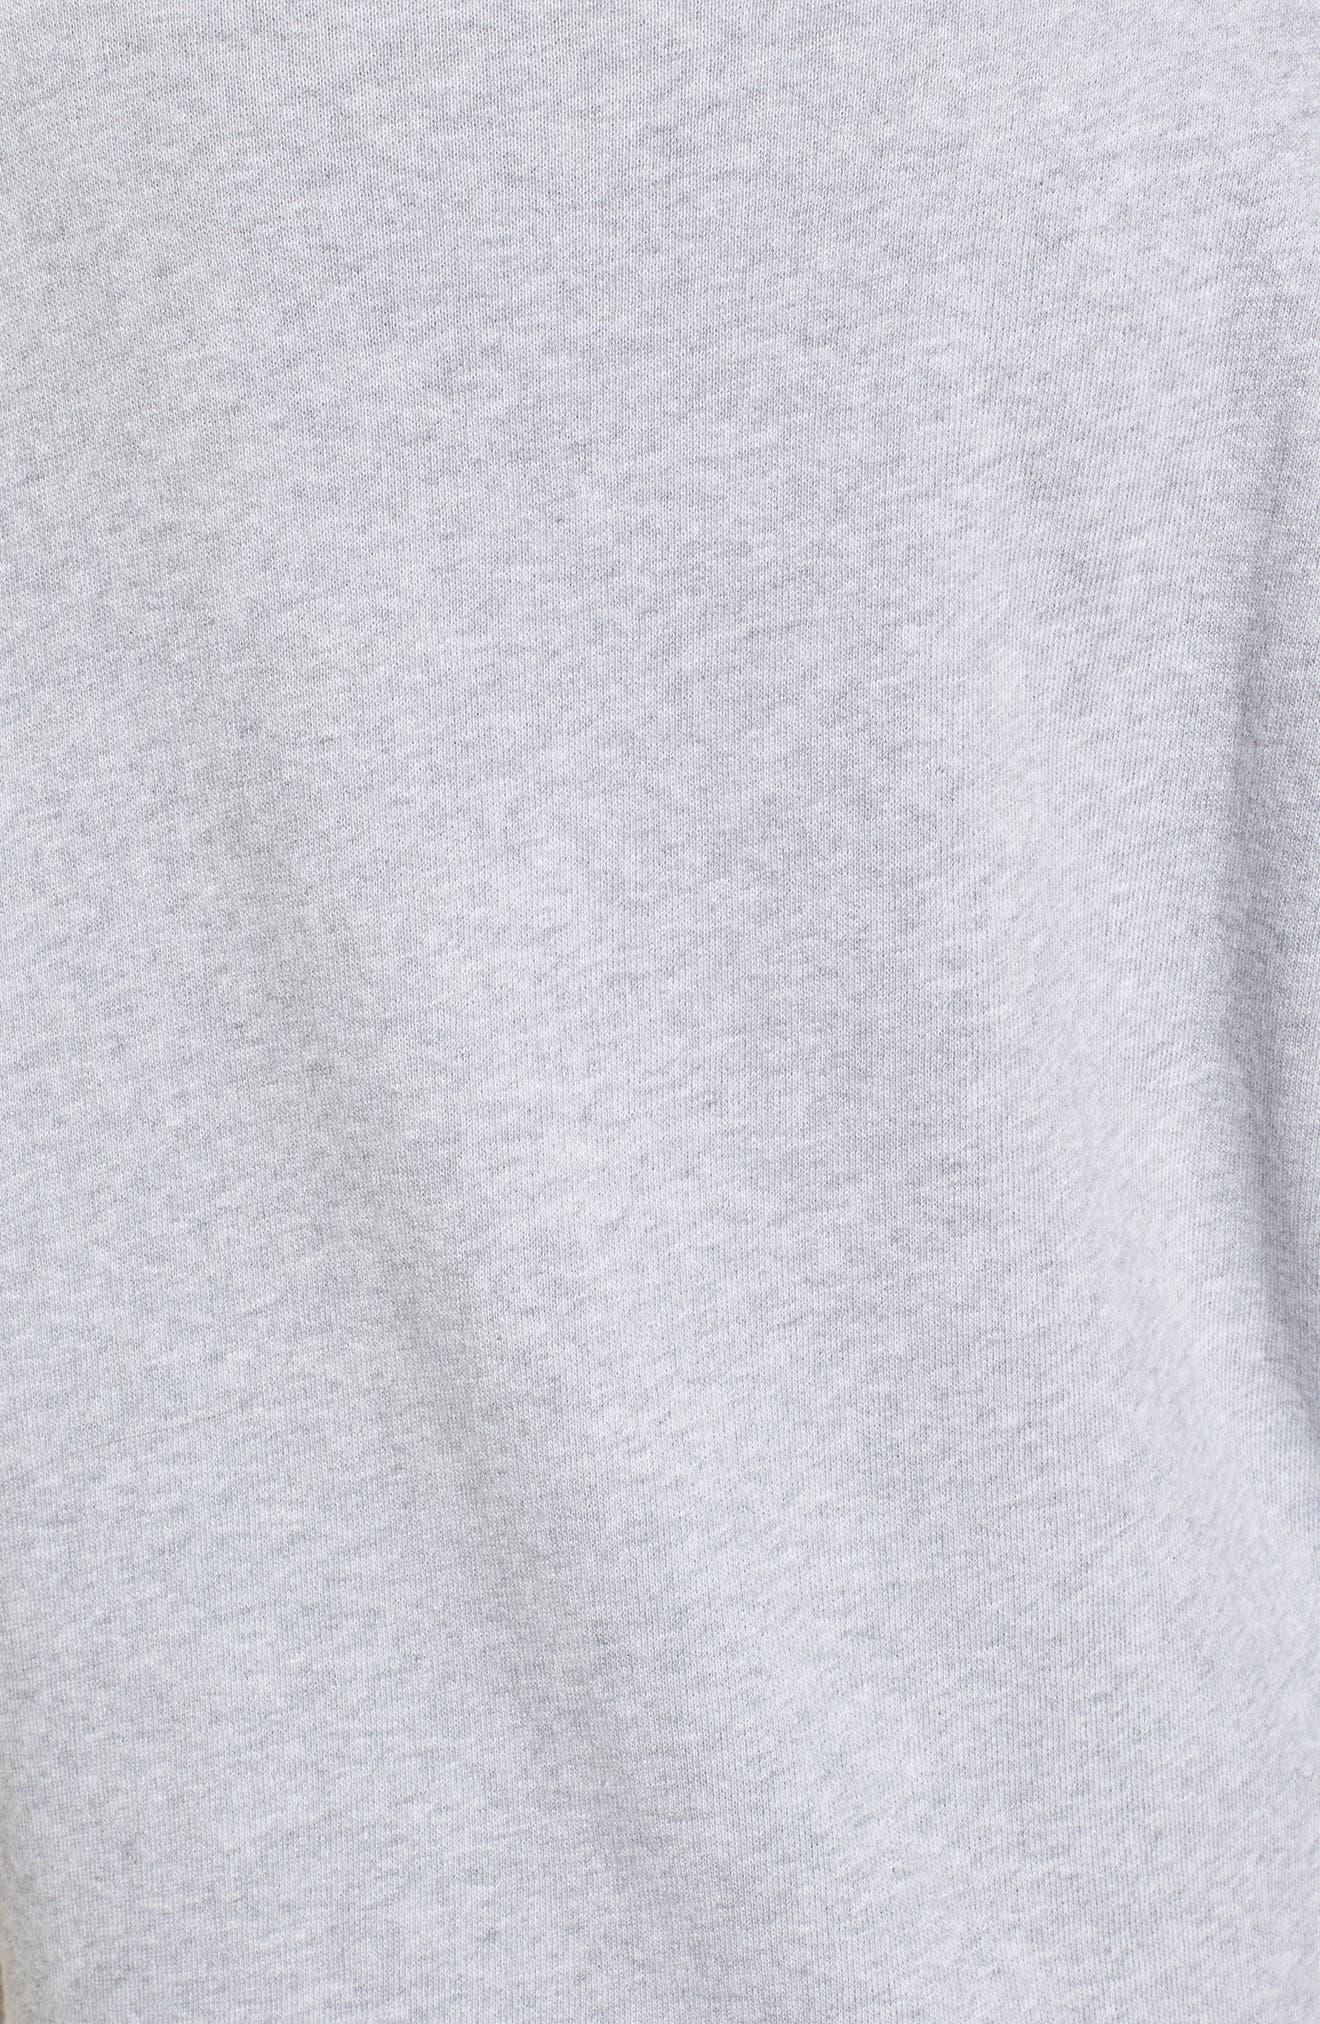 Tie Sleeve Sweater,                             Alternate thumbnail 9, color,